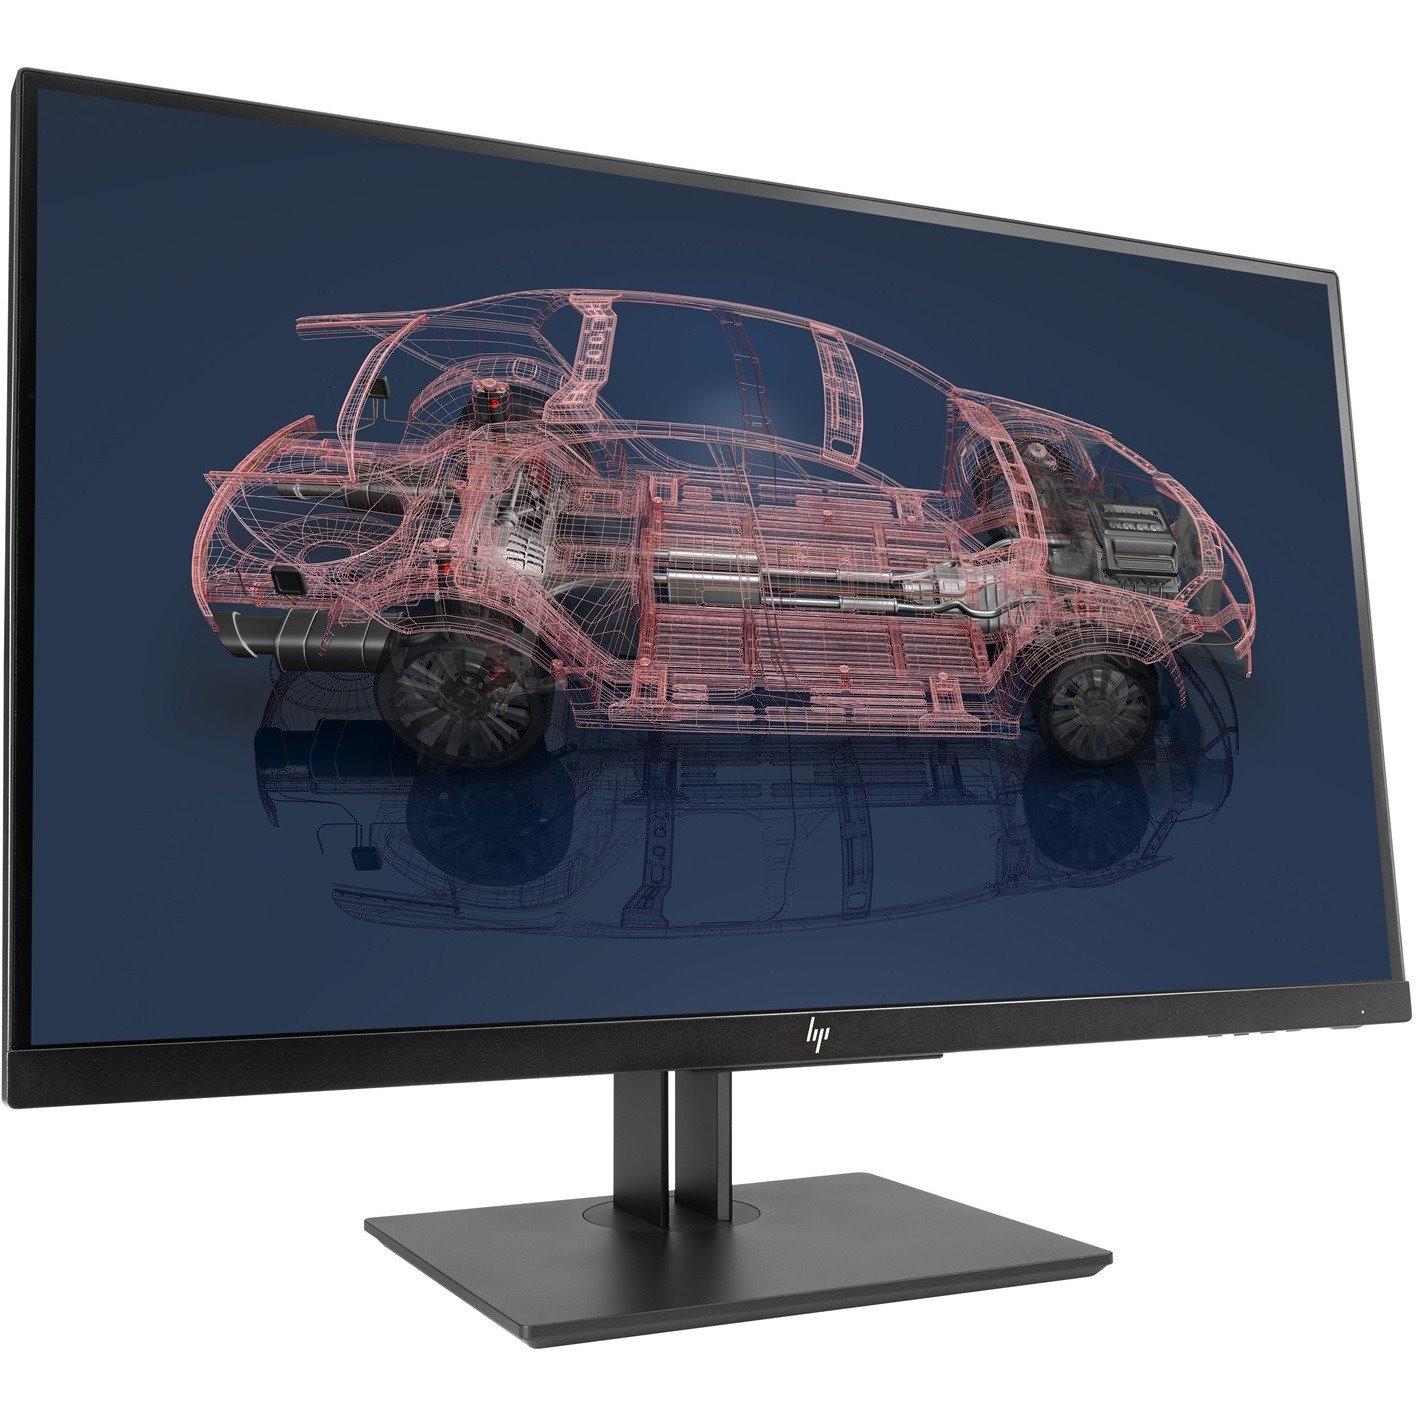 "HP Business Z27n G2 68.6 cm (27"") WQHD LED LCD Monitor - 16:9 - Black"